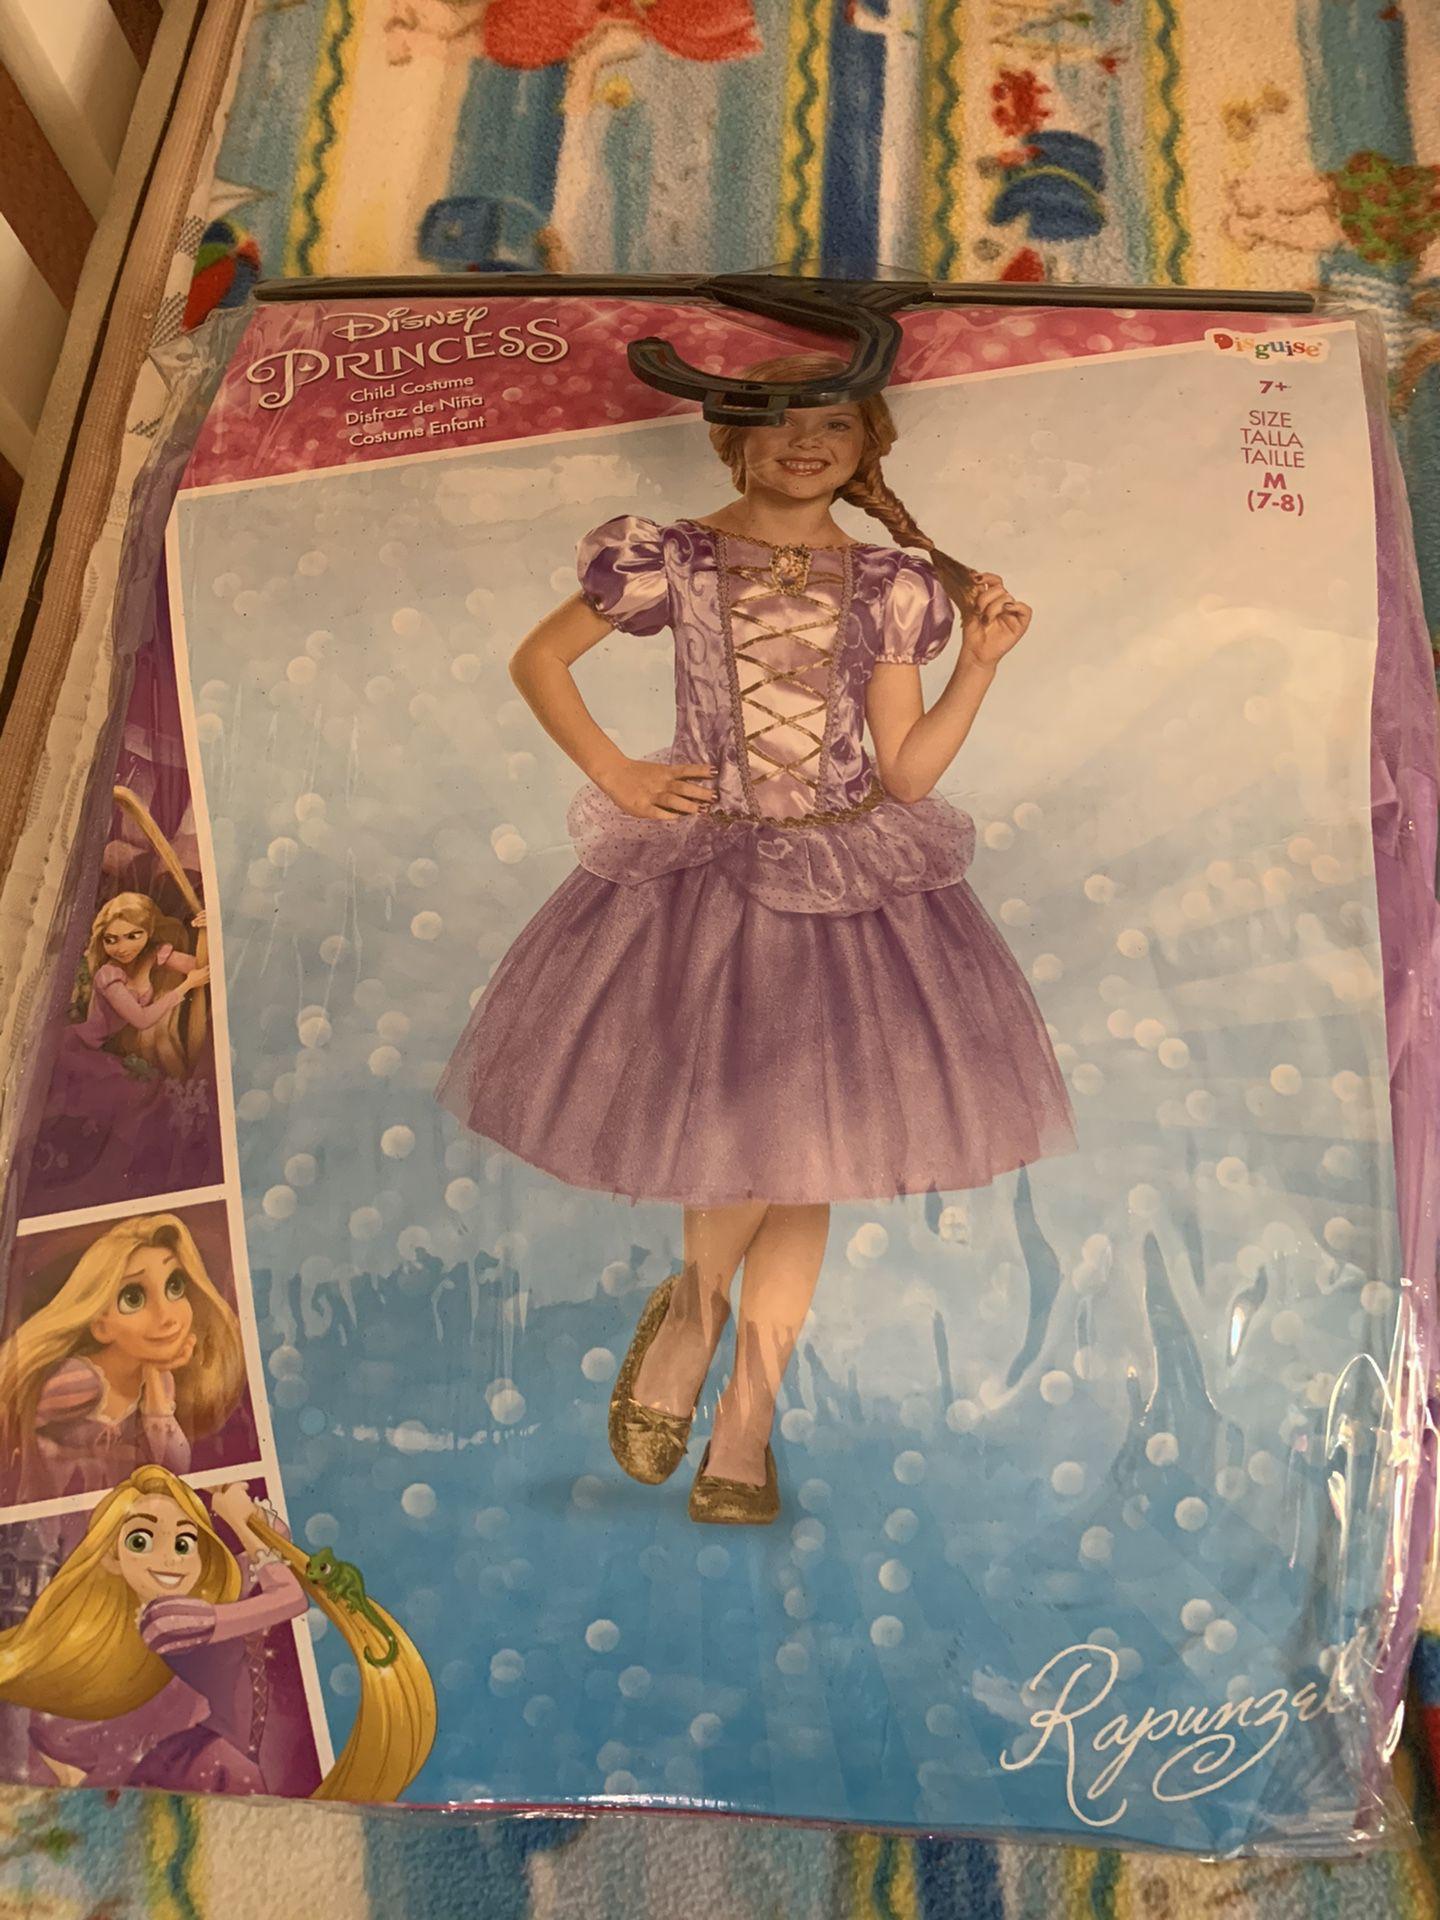 Rapunzel costume size 7-8